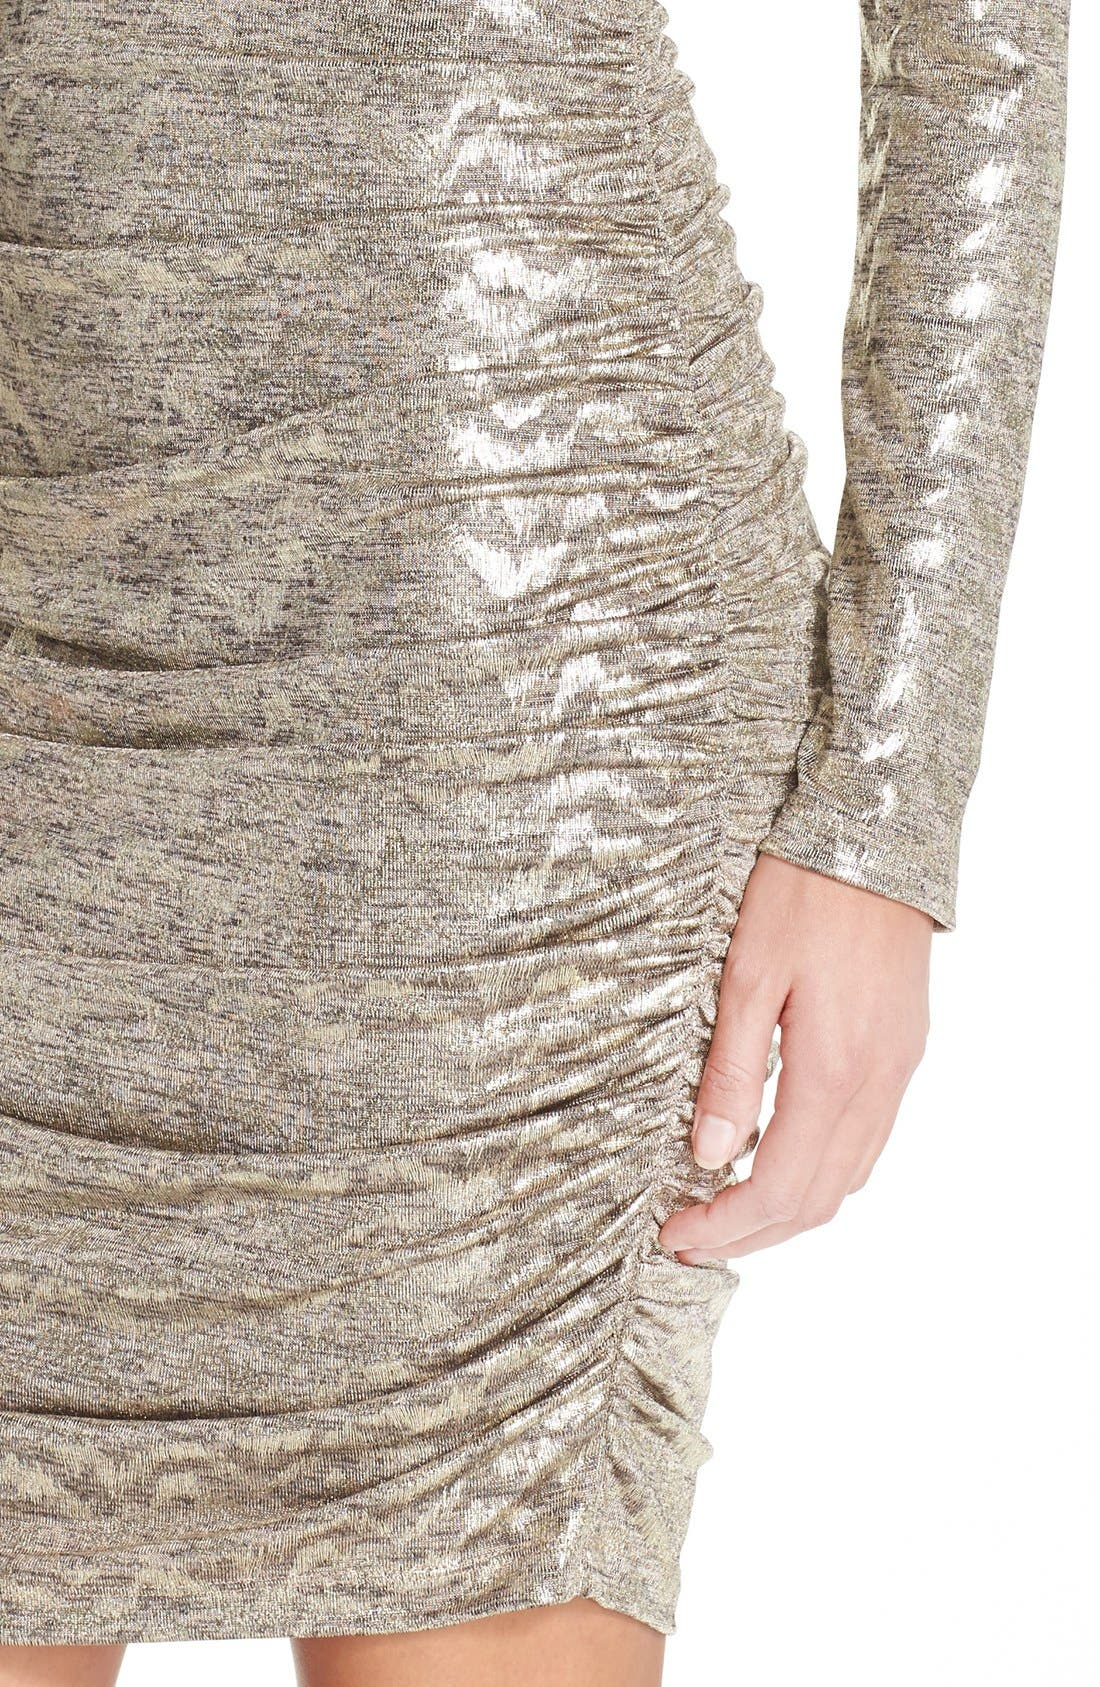 VINCE CAMUTO, Metallic Jersey Body-Con Dress, Alternate thumbnail 2, color, 710